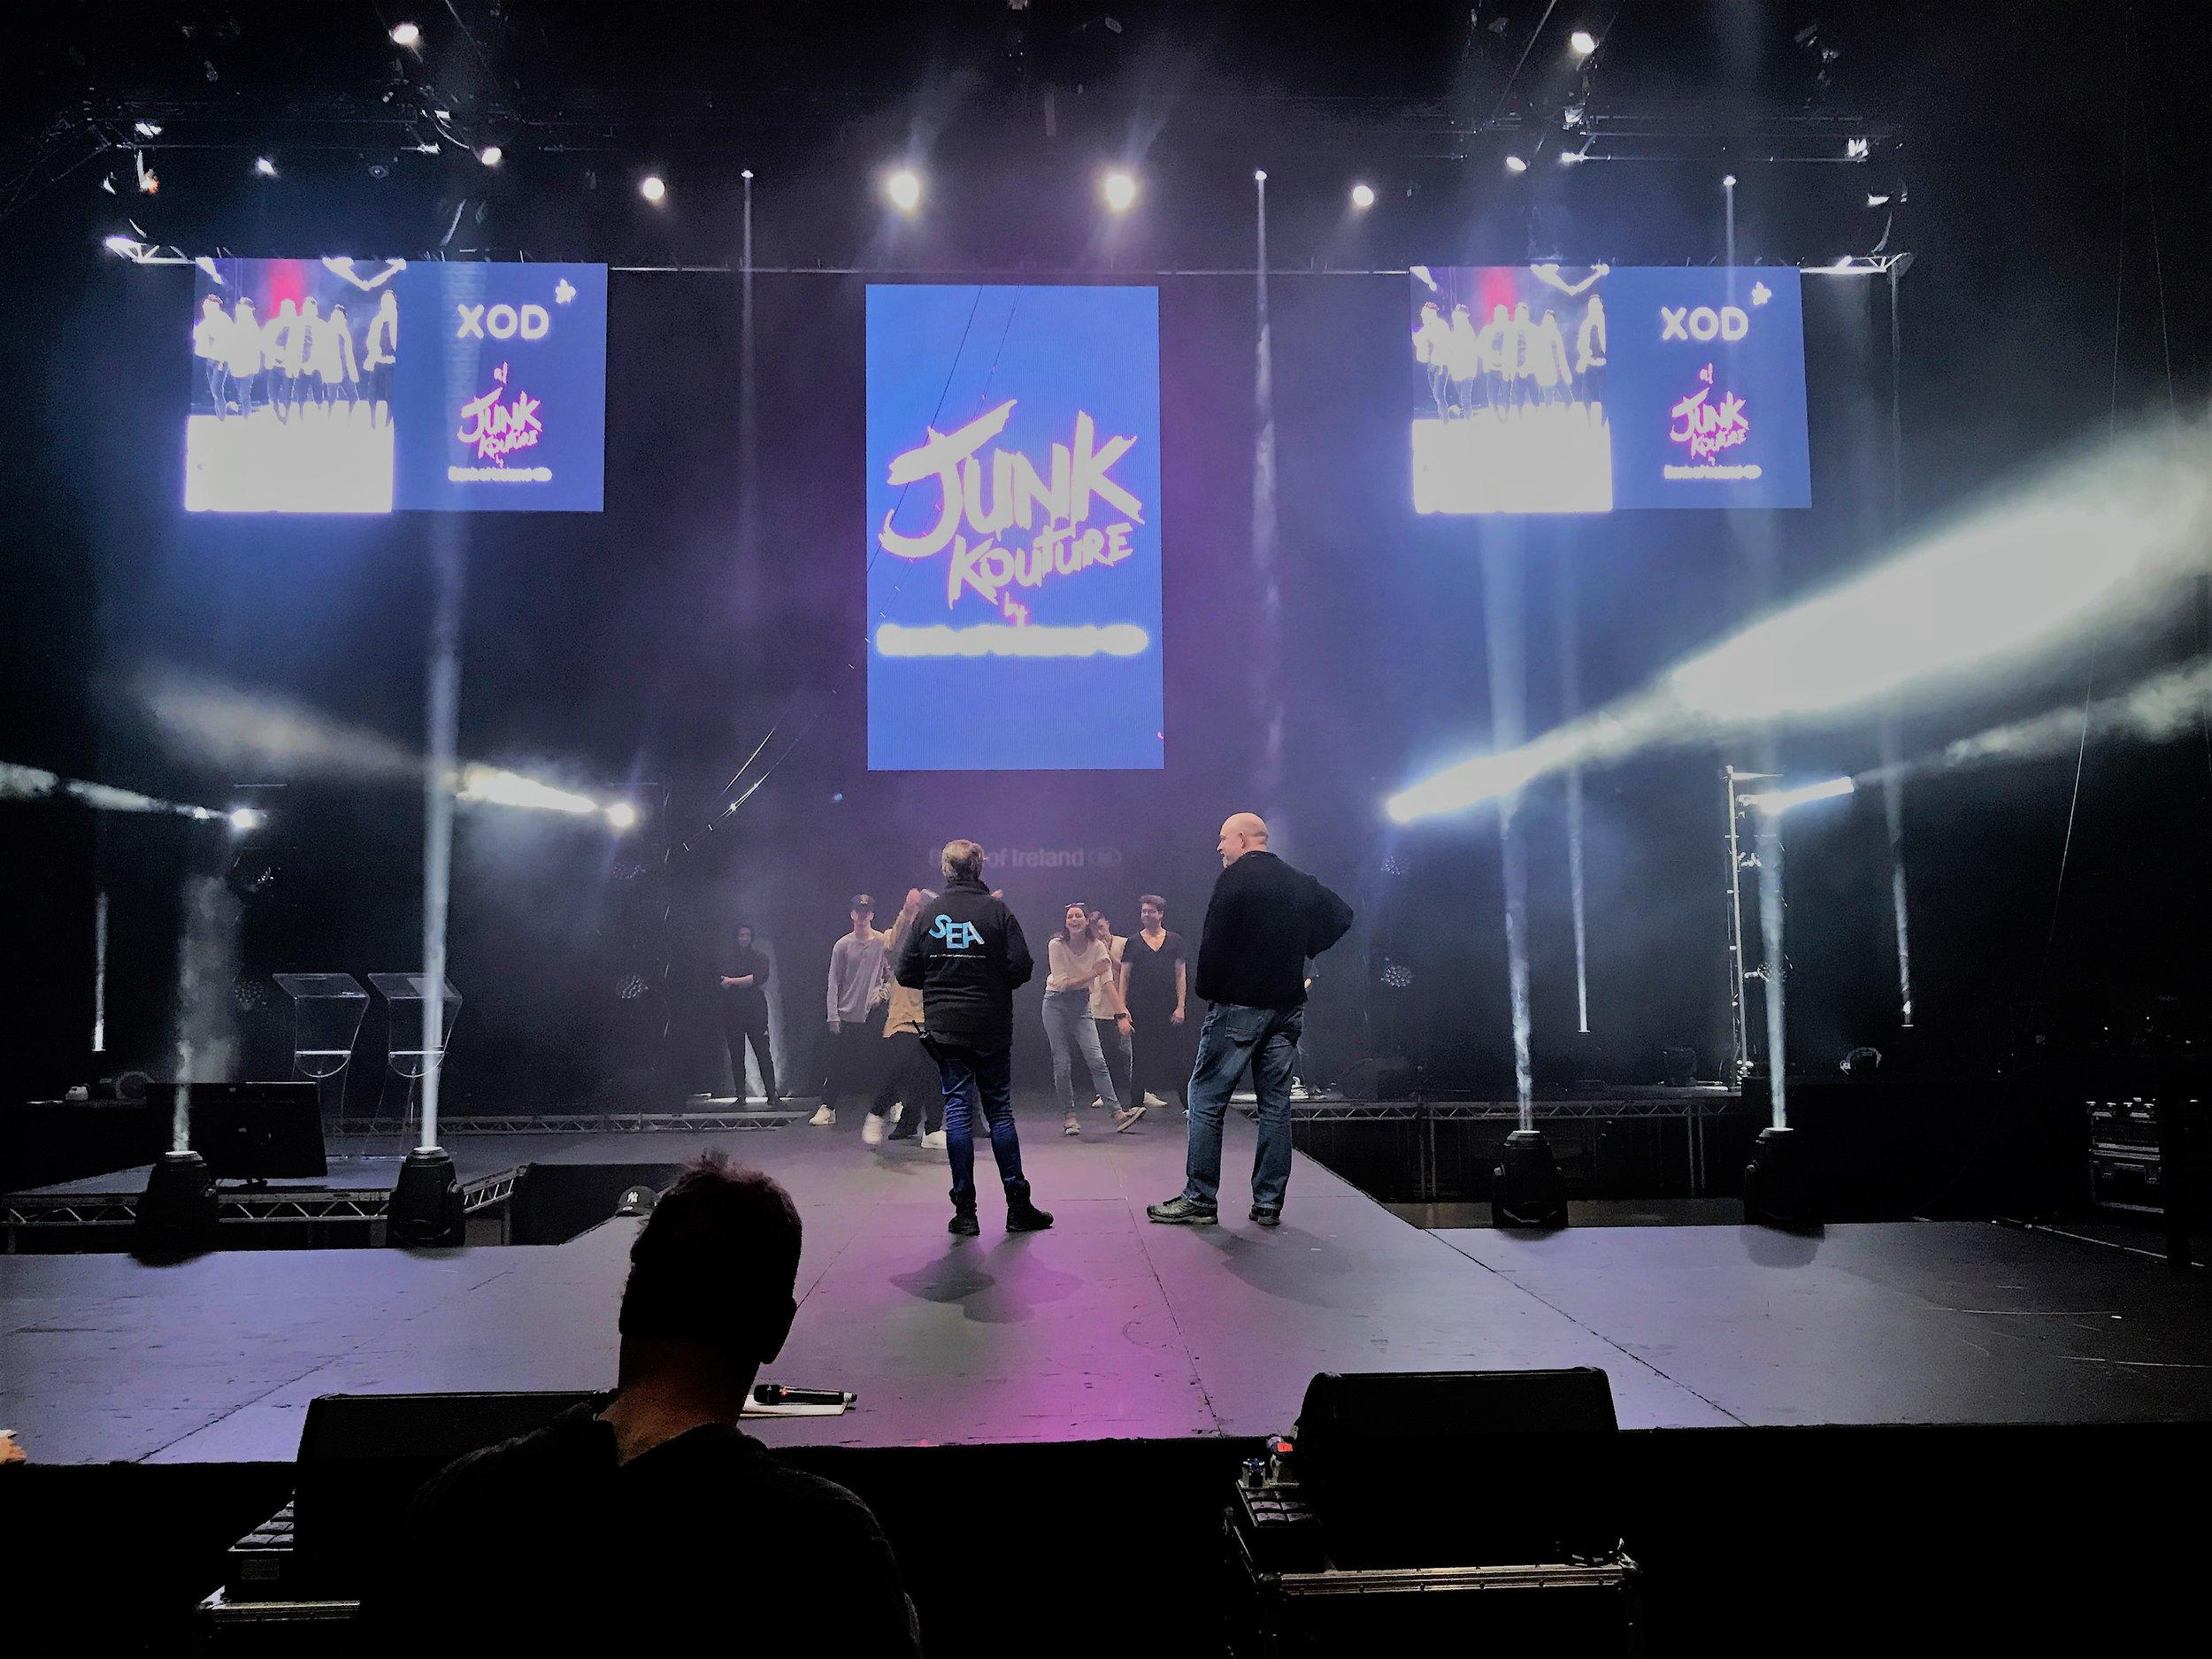 Junk Kouture 2018 - SEA Team (1).jpg